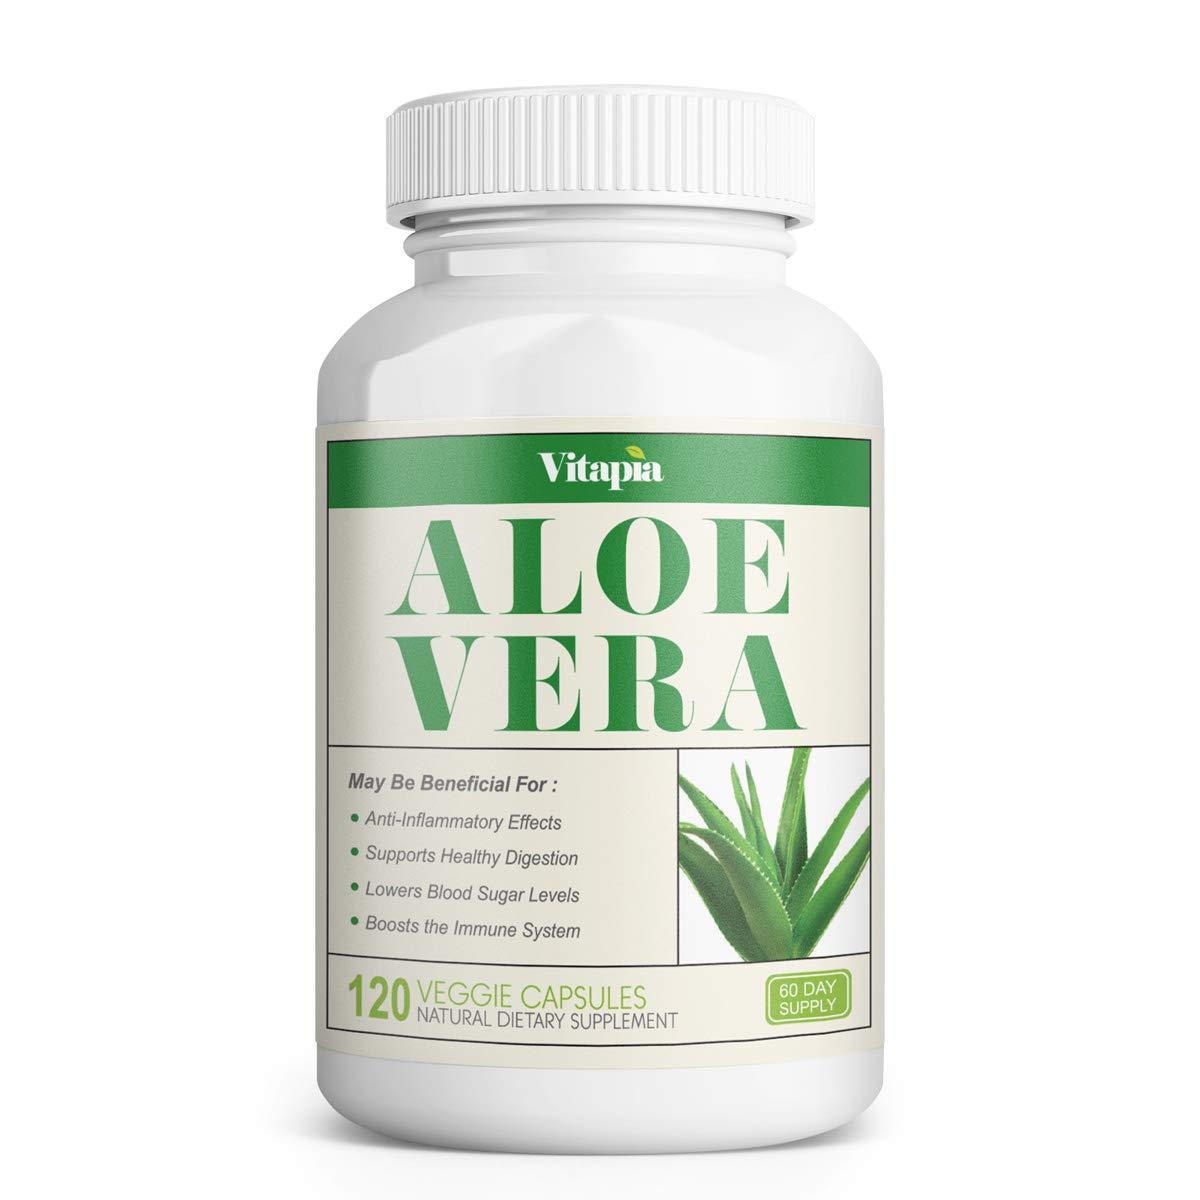 Vitapia Aloe Vera 1000mg - 120 Veggie Capsules - Vegan and Non-GMO - Aloe Vera Supplement - Supports Digestive Health & Healthy Blood Sugar Levels, Anti-Inflammatory